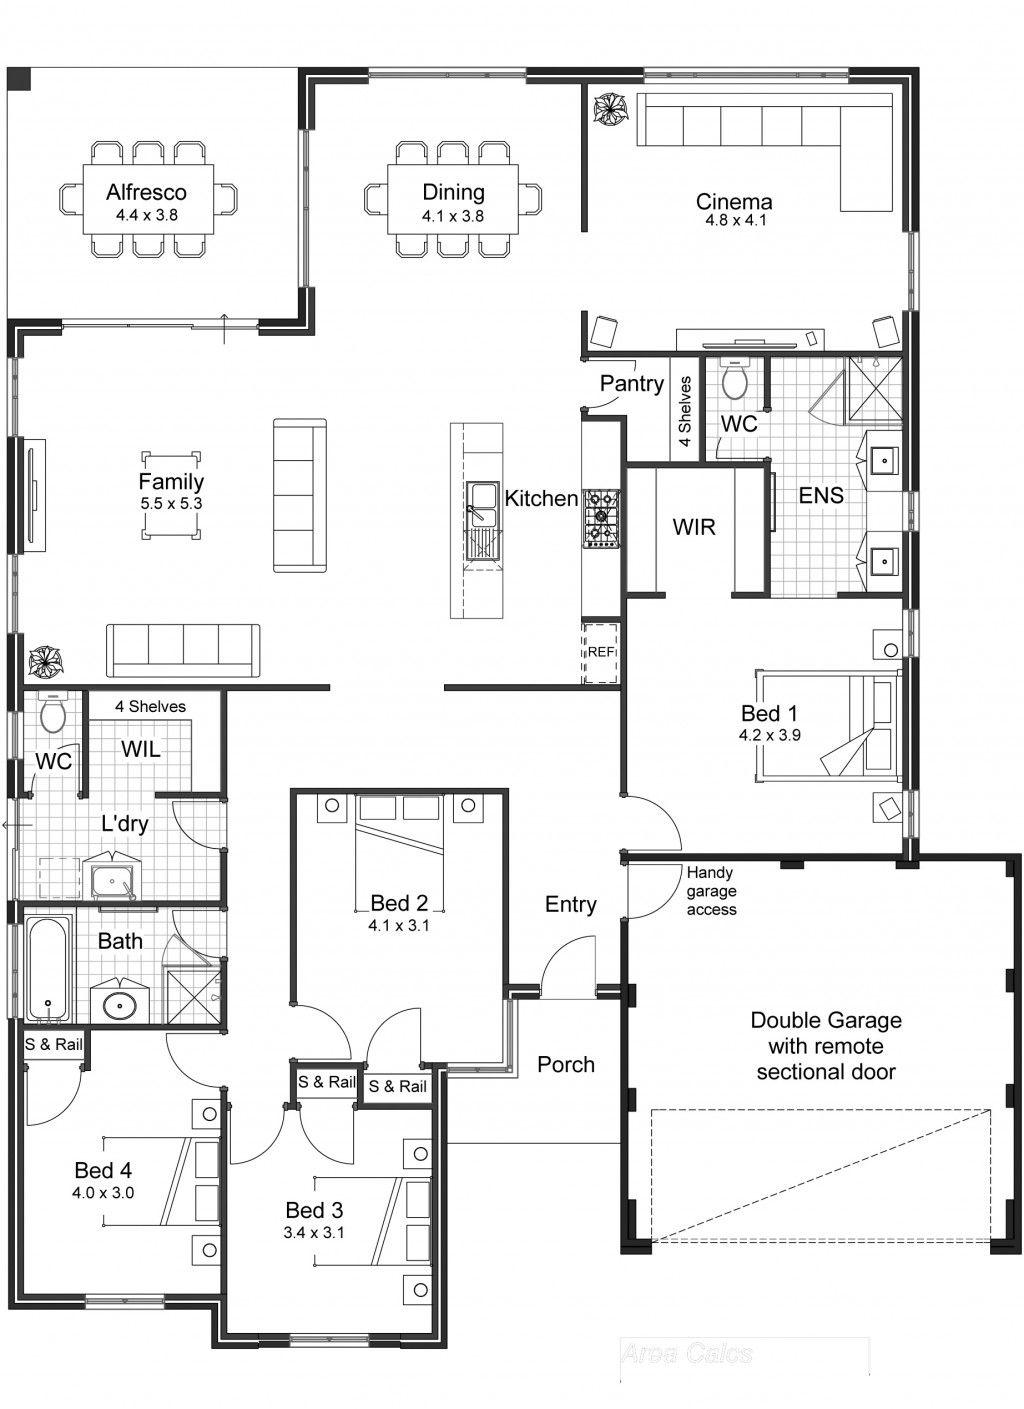 5 Bedroom Home Designs Open Floor Plans For Homes With Nice Open Floor Plans For Modular